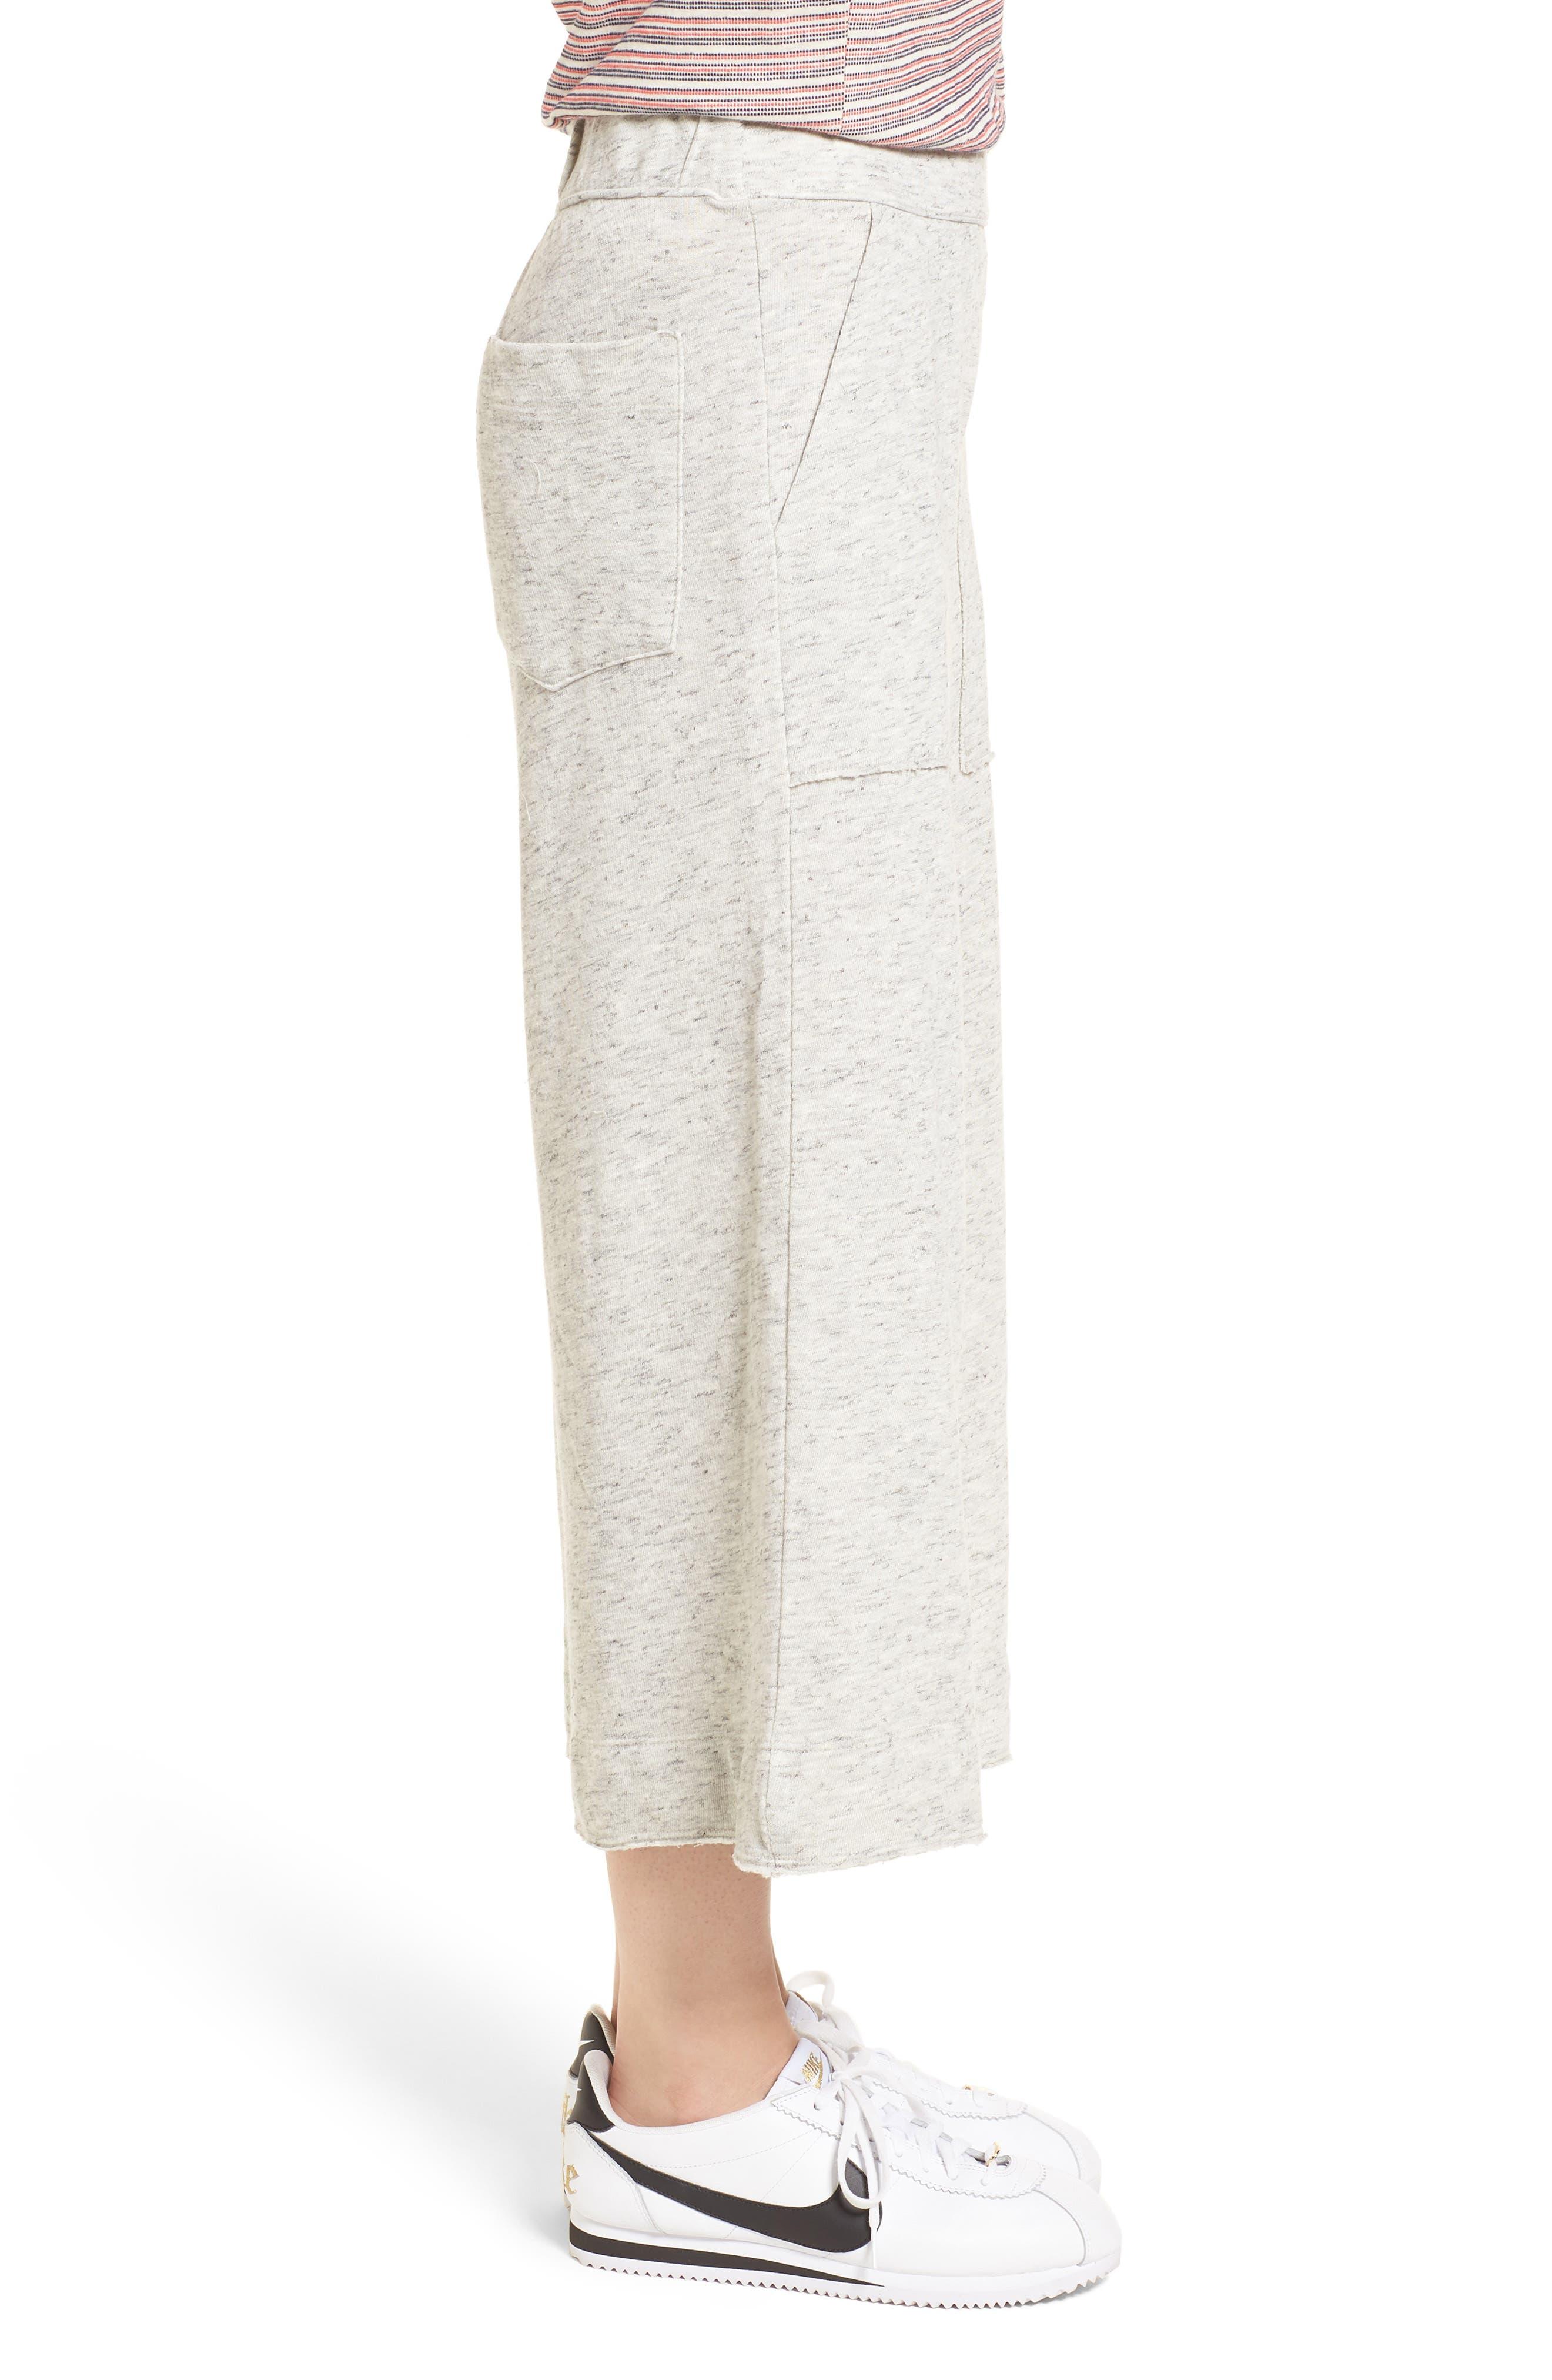 Sidelight Culotte Sweatpants,                             Alternate thumbnail 3, color,                             Grey